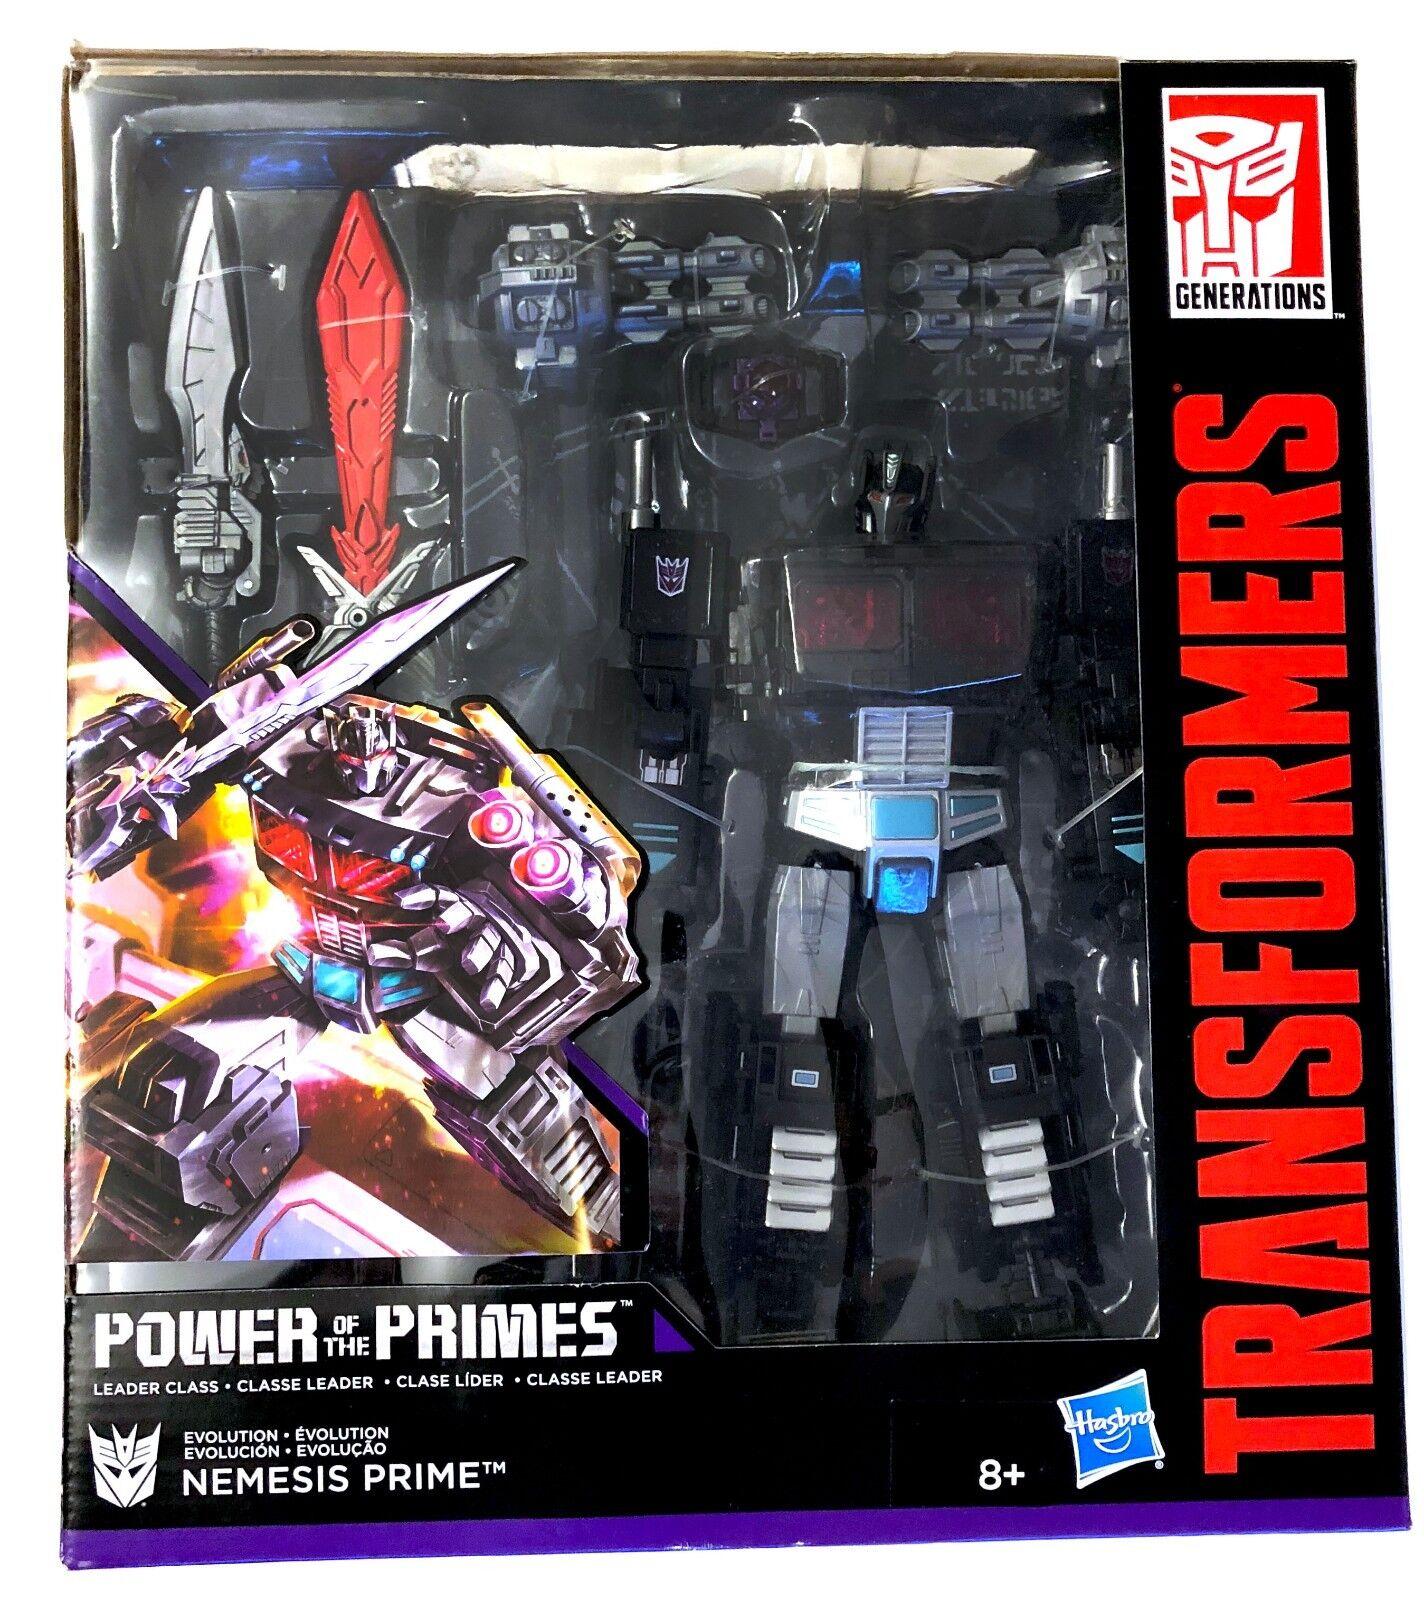 Transformers Transformers Transformers potp potenza dei numeri primi leaderclass NEMESIS PRIME d0b7cf